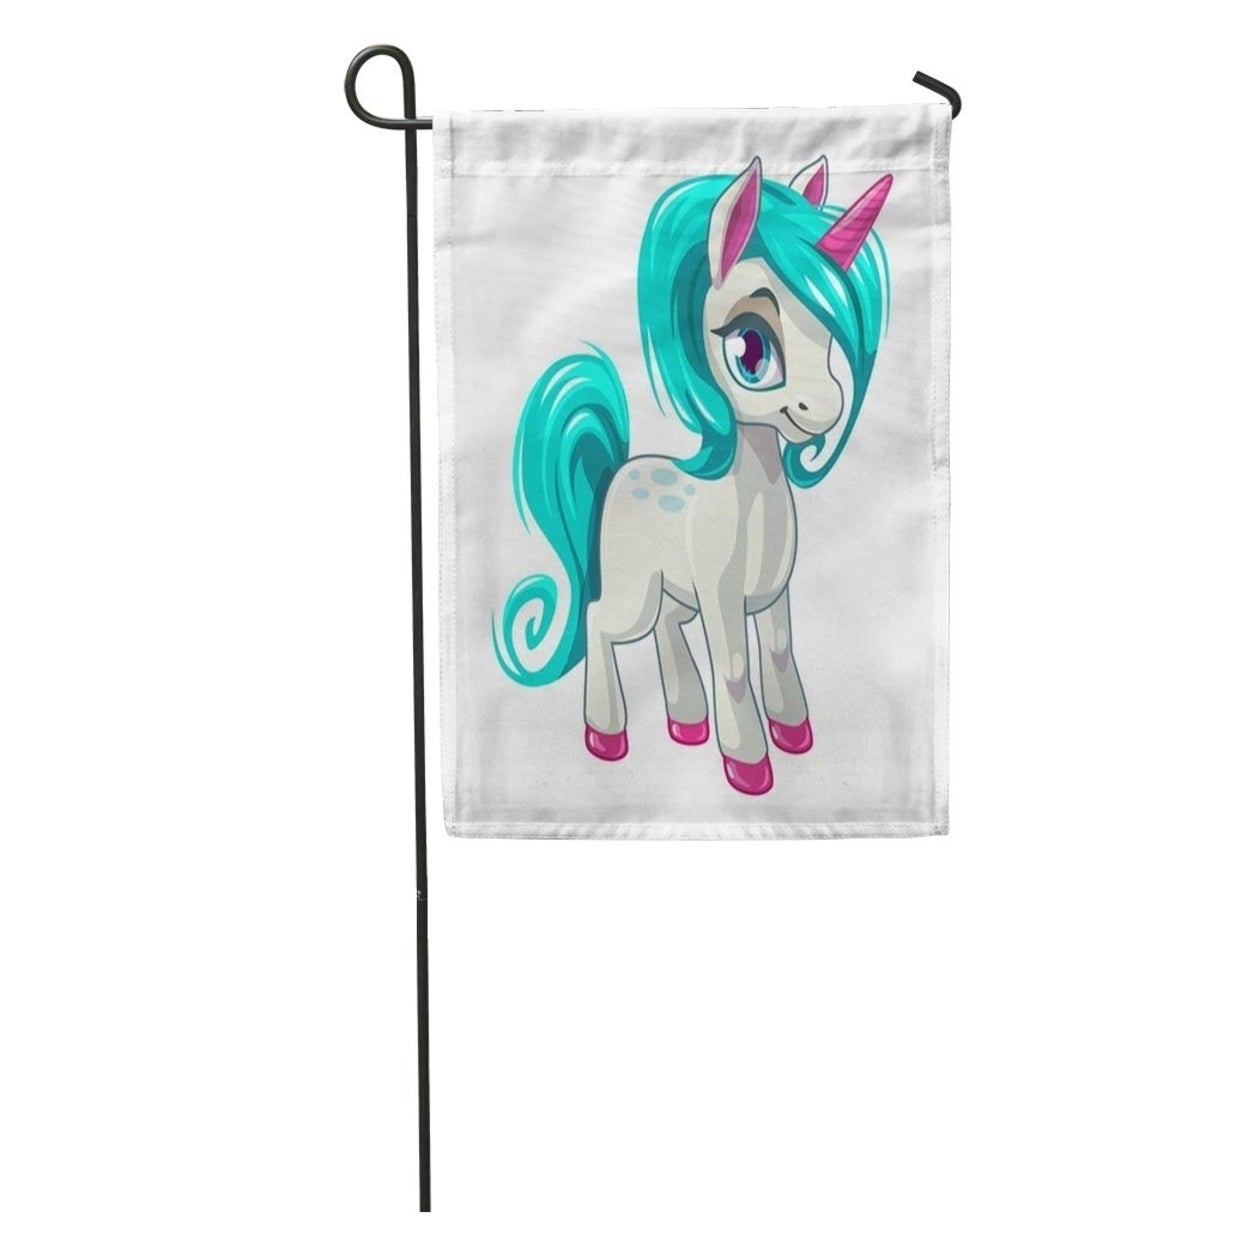 Shop Baby Cute Cartoon Unicorn Fantasy Little Beautiful Horse Girlissh Character Garden Flag Decorative Flag House Banner 28x On Sale Overstock 31401958